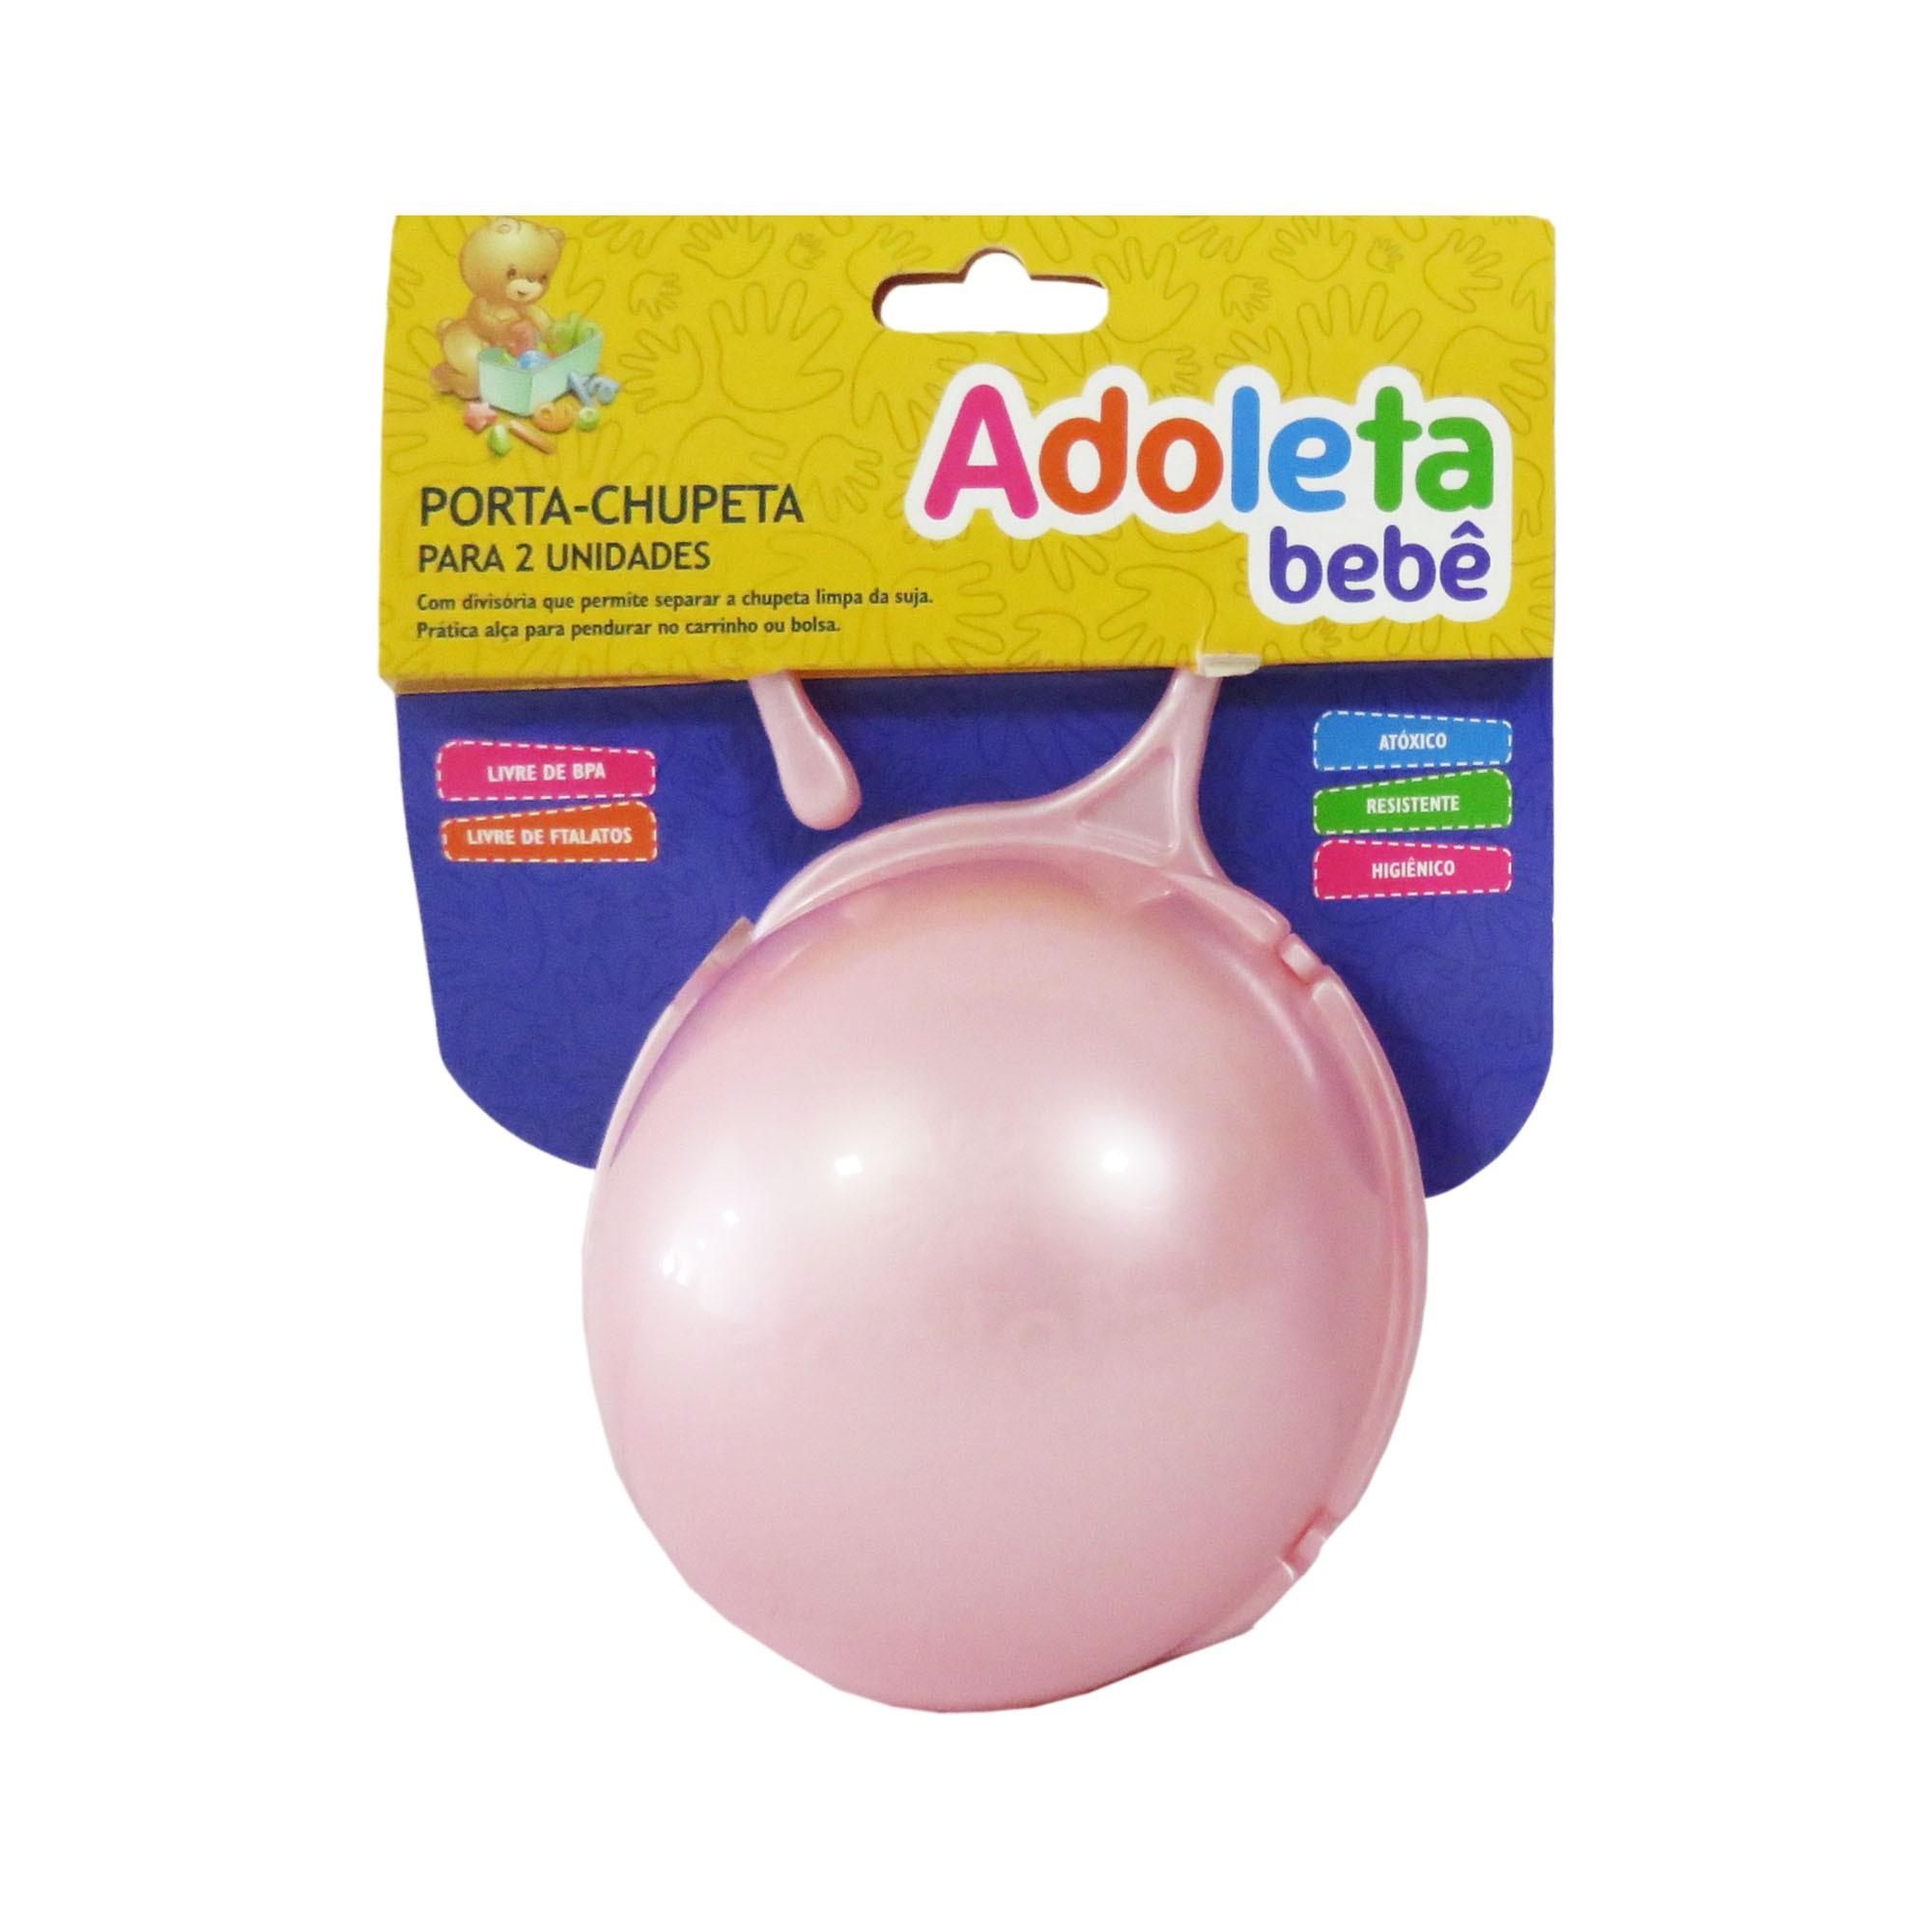 Porta-Chupeta Cajovil Adoleta - Para 2 Unidades - Rosa